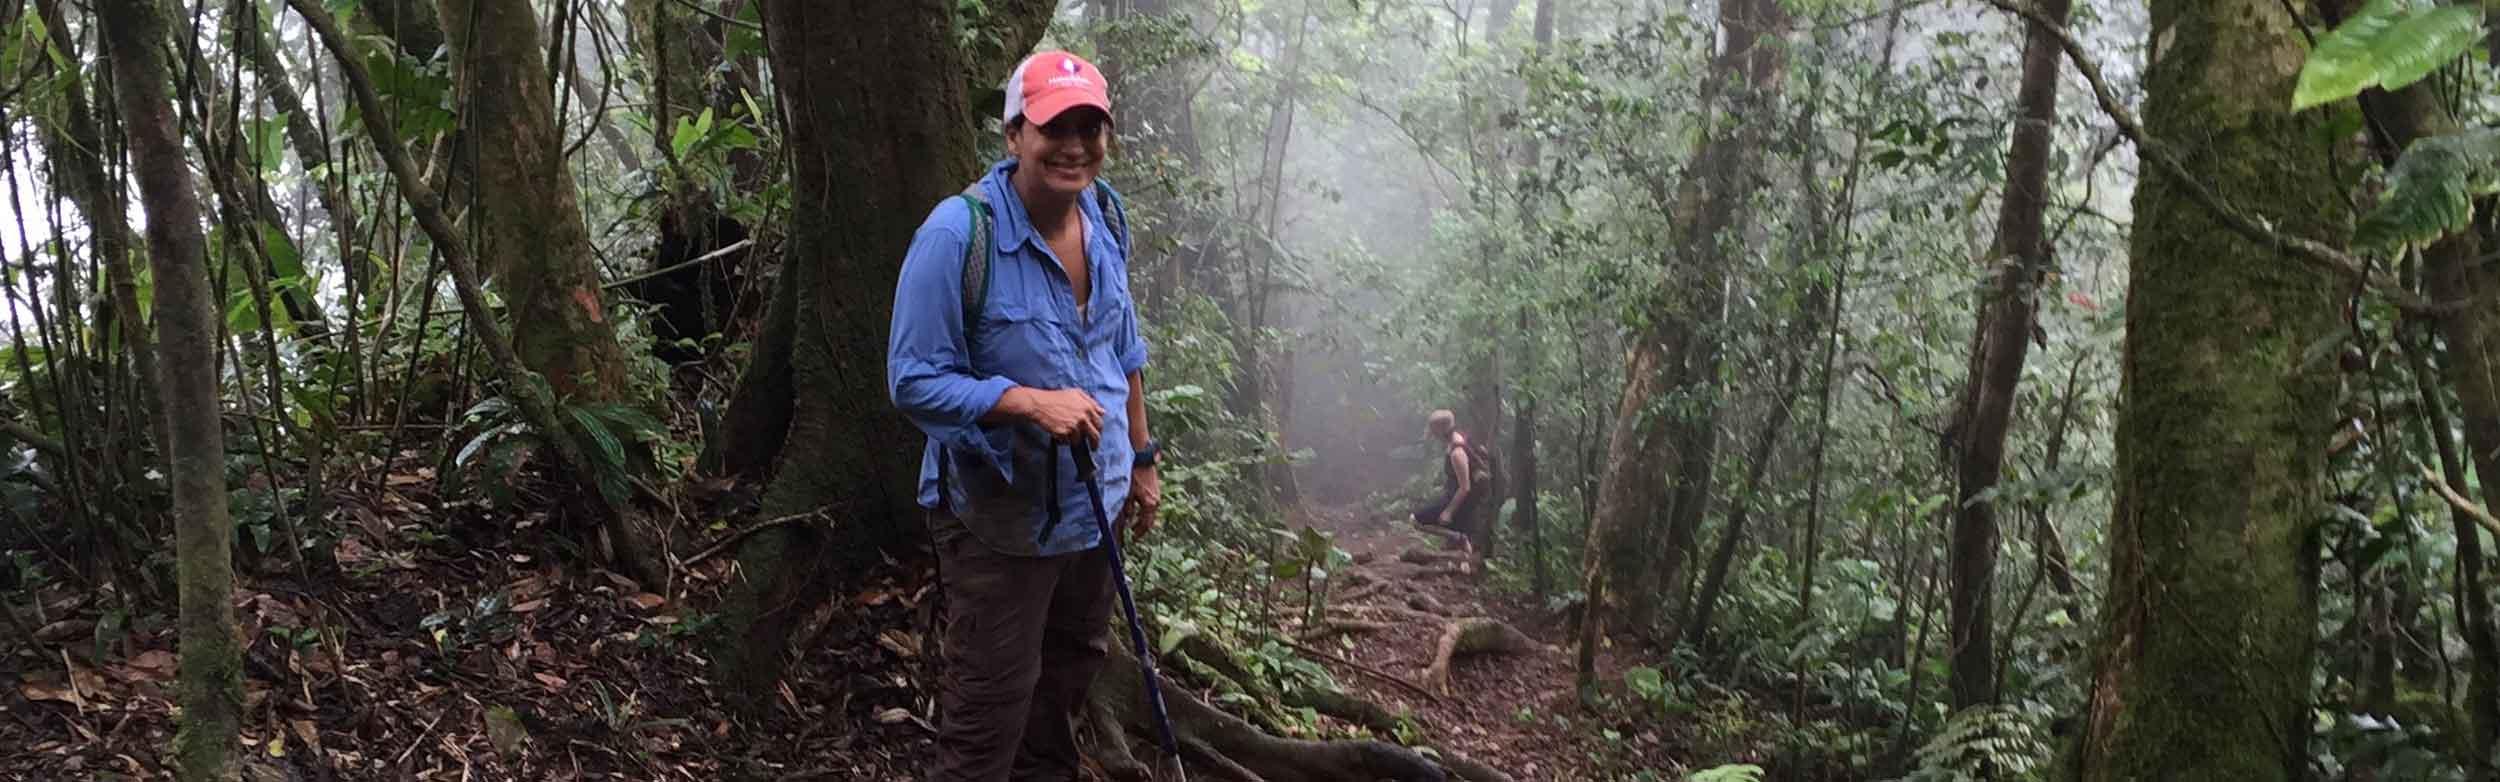 Hiking Campana National Park